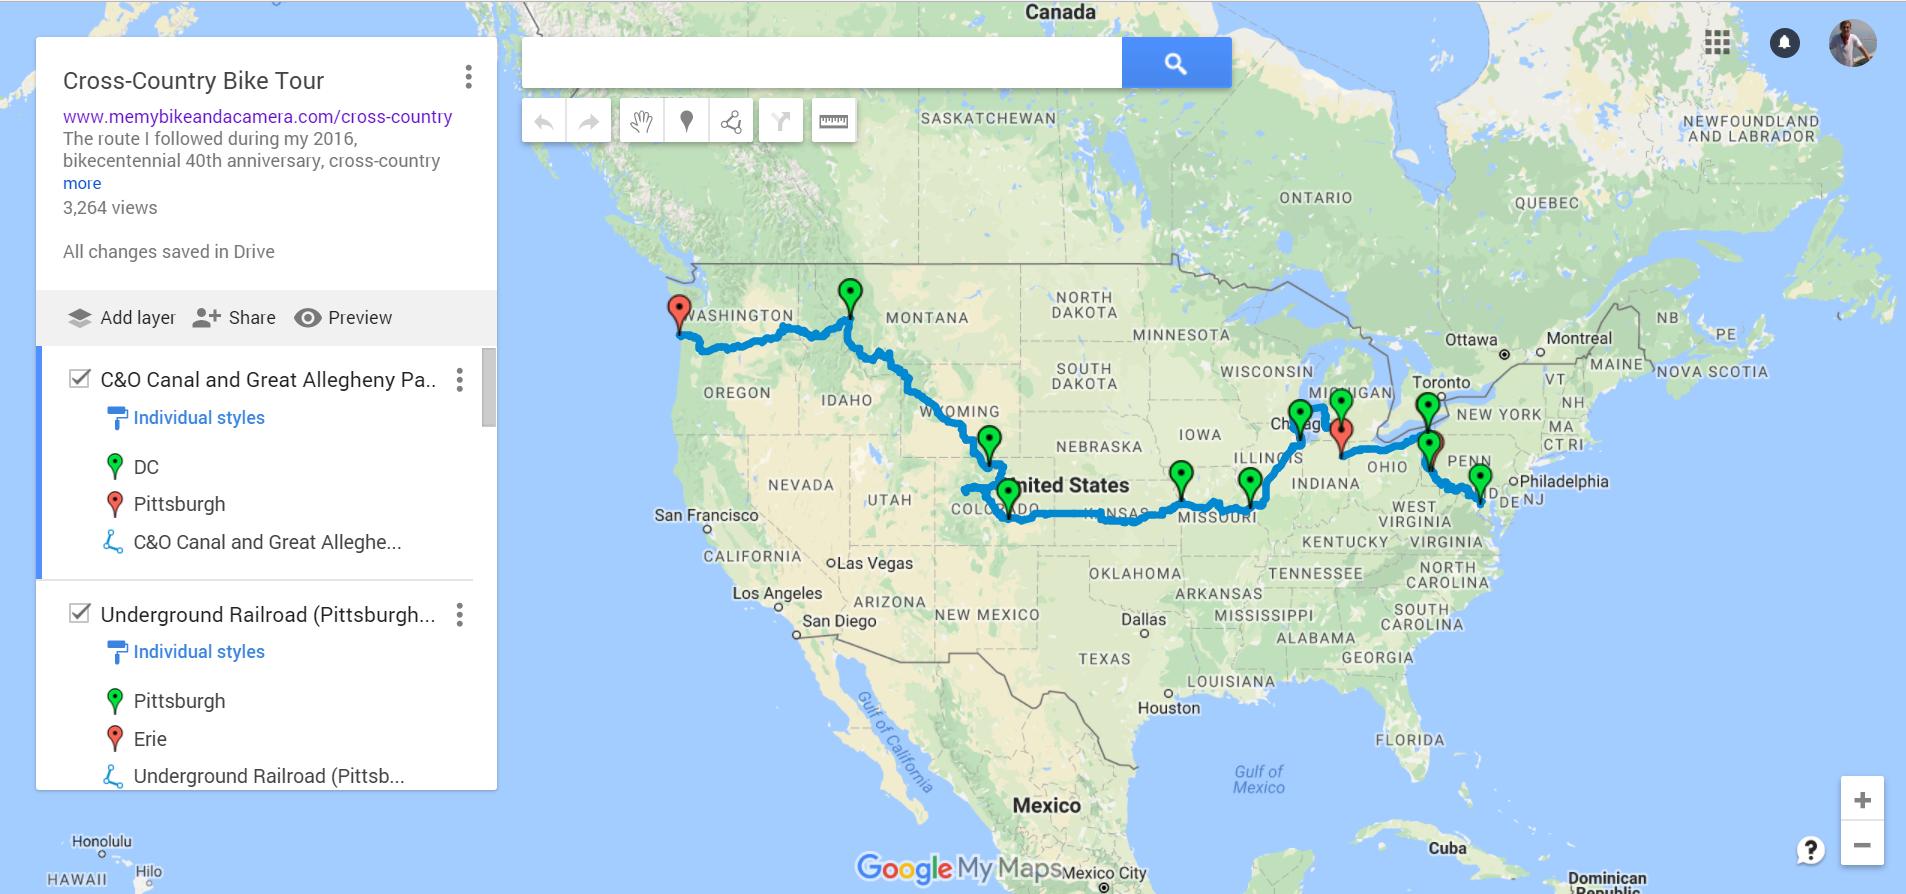 Working version of custom bike map in Google My Maps